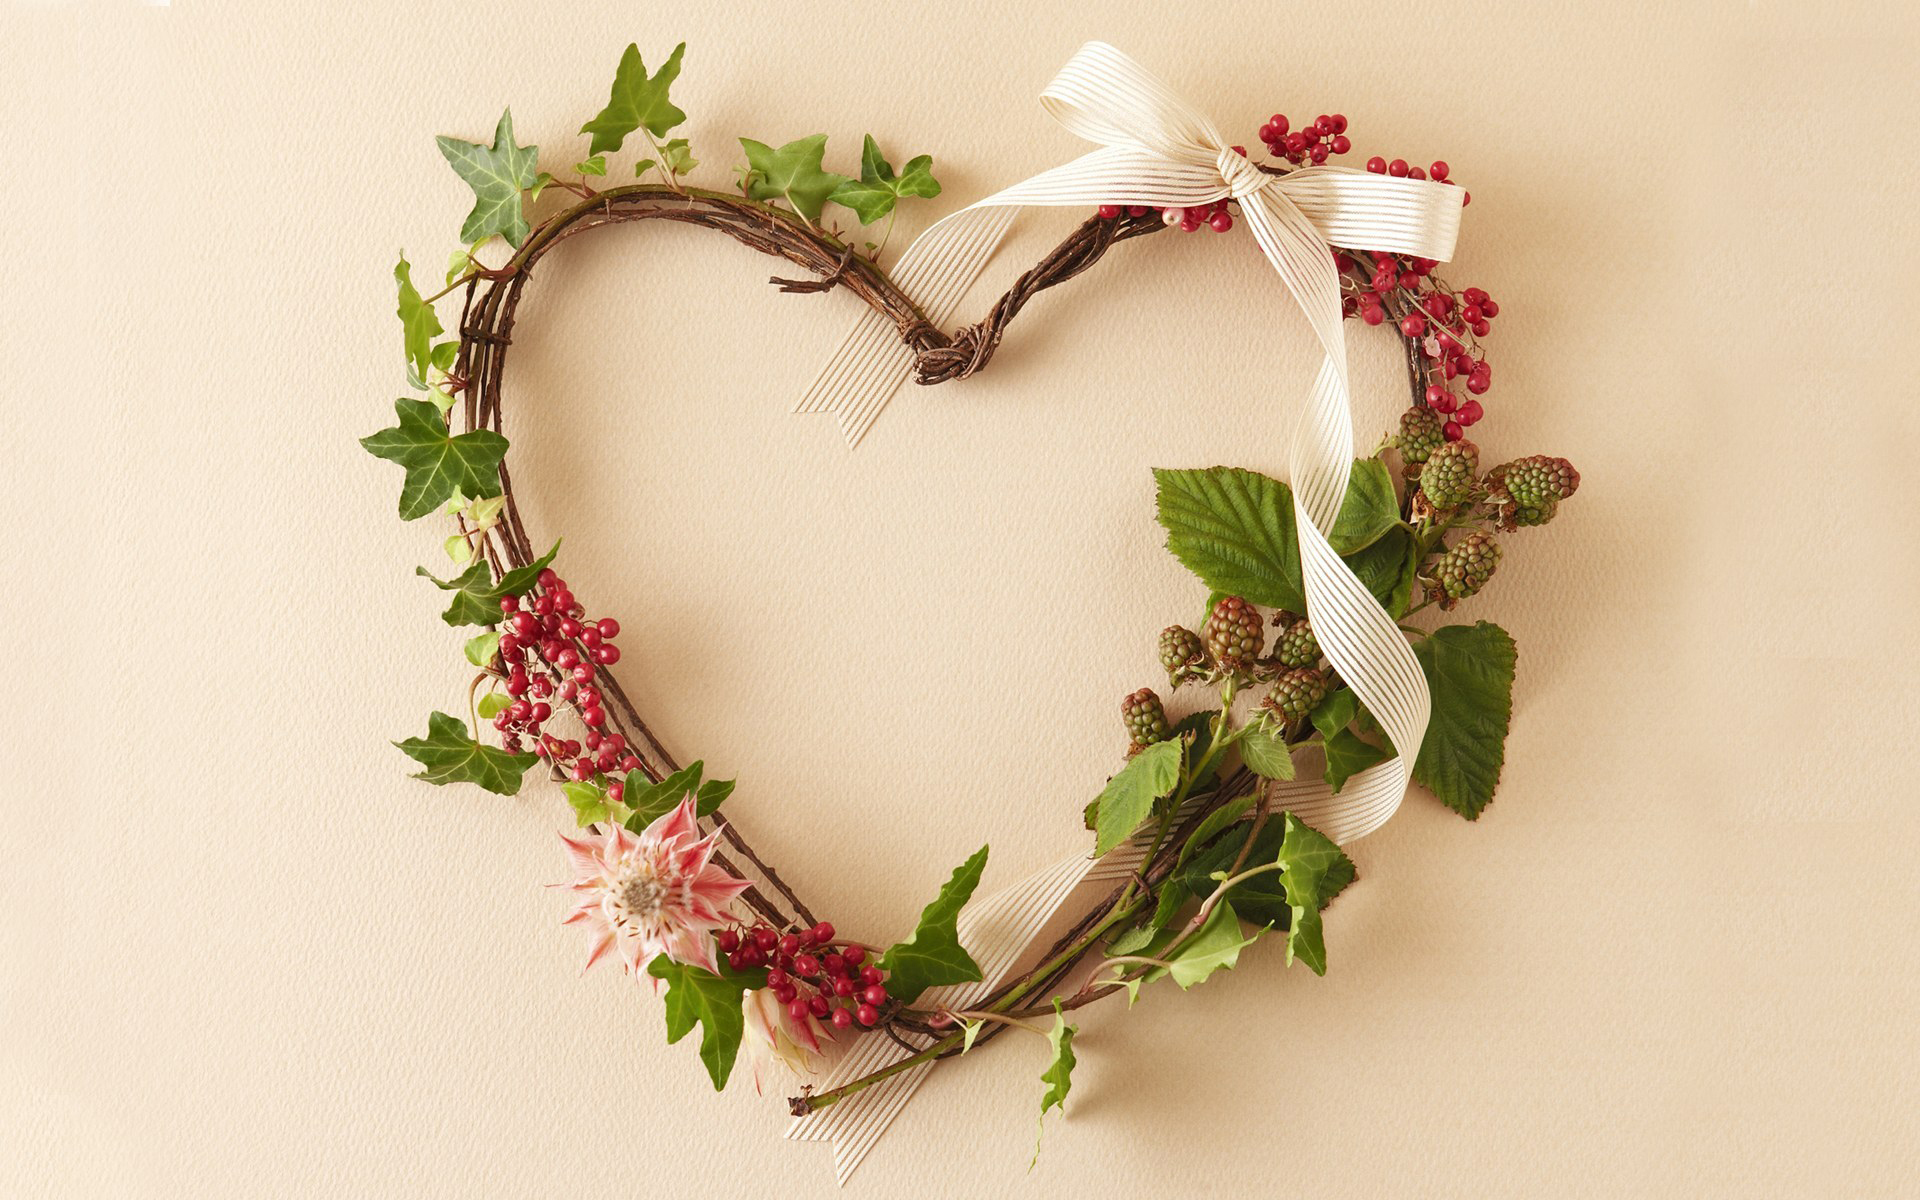 Сердце из зелени  № 1599071 бесплатно